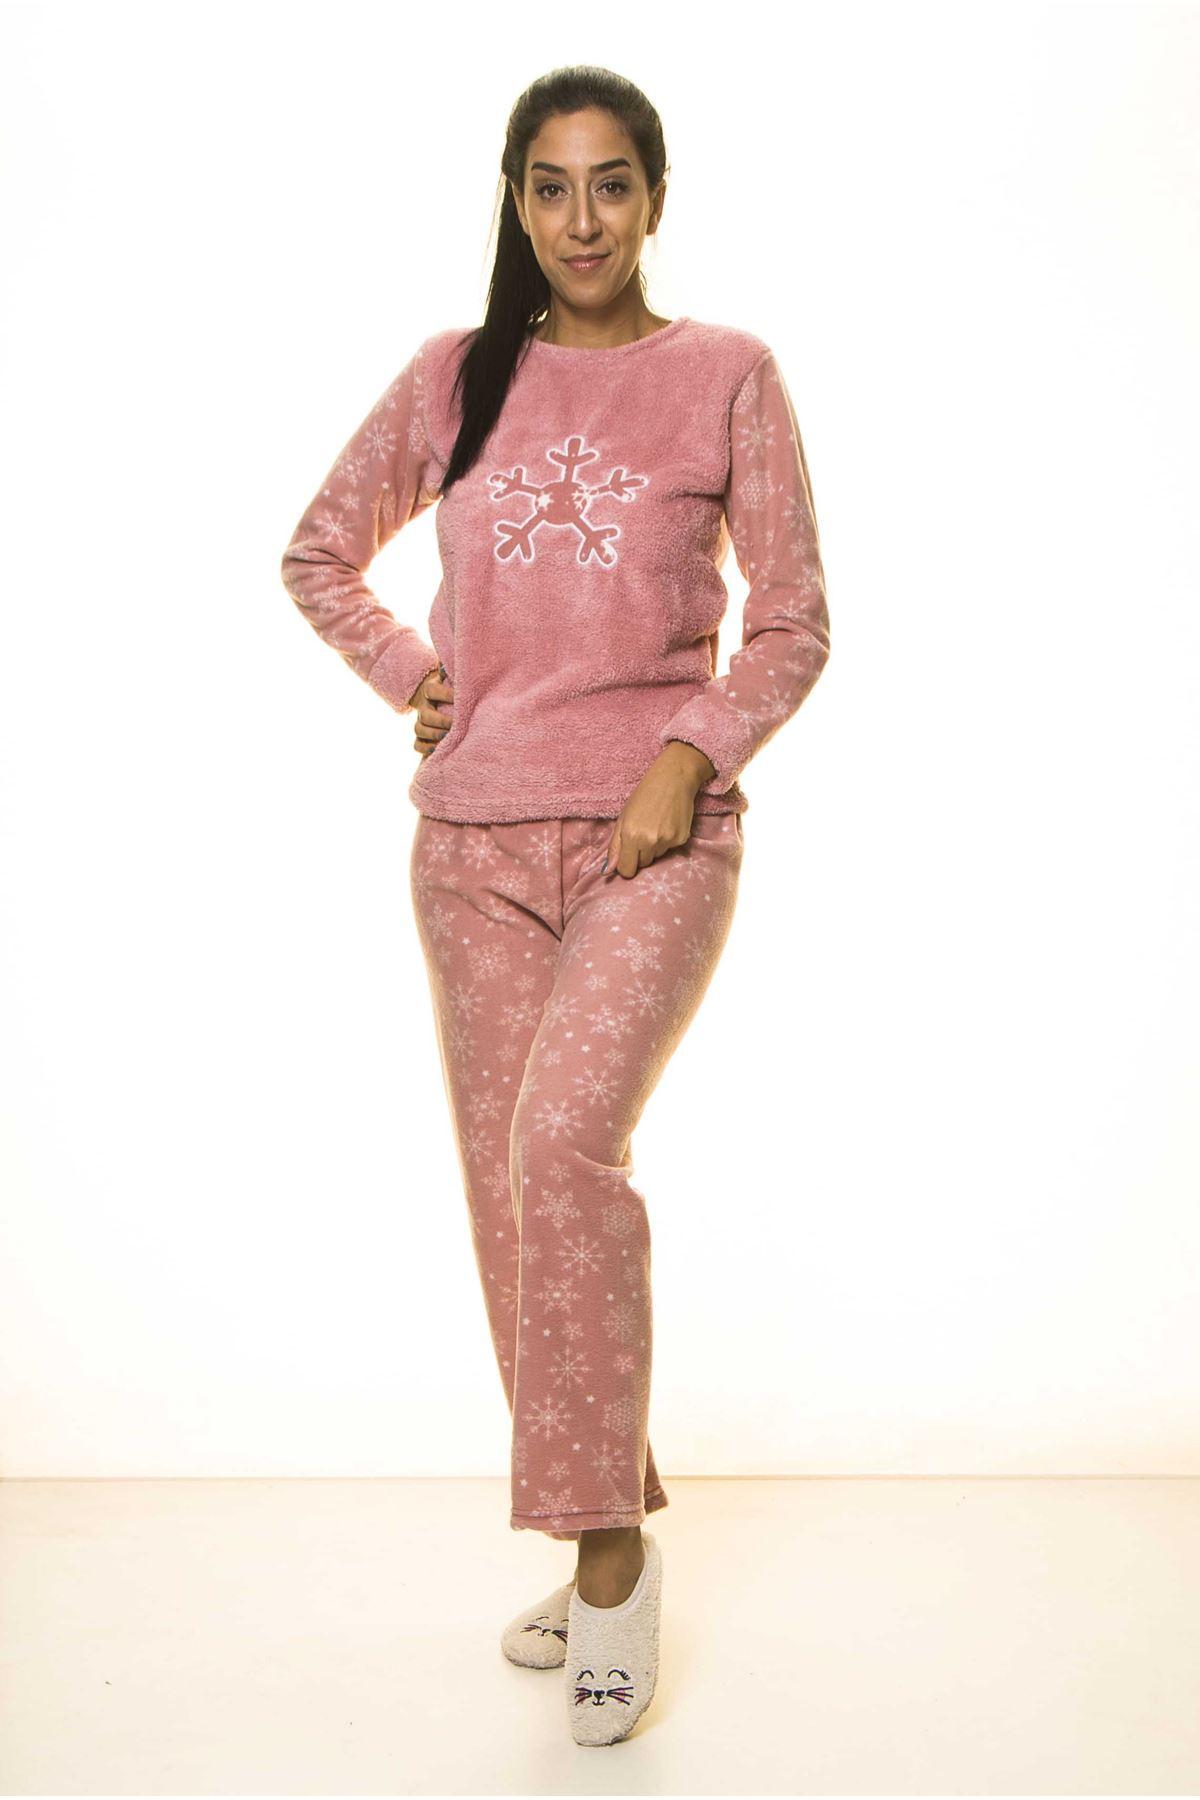 Pembe Kışlık Kar Tanesi Welsoft Peluş Pijama 2C-2048